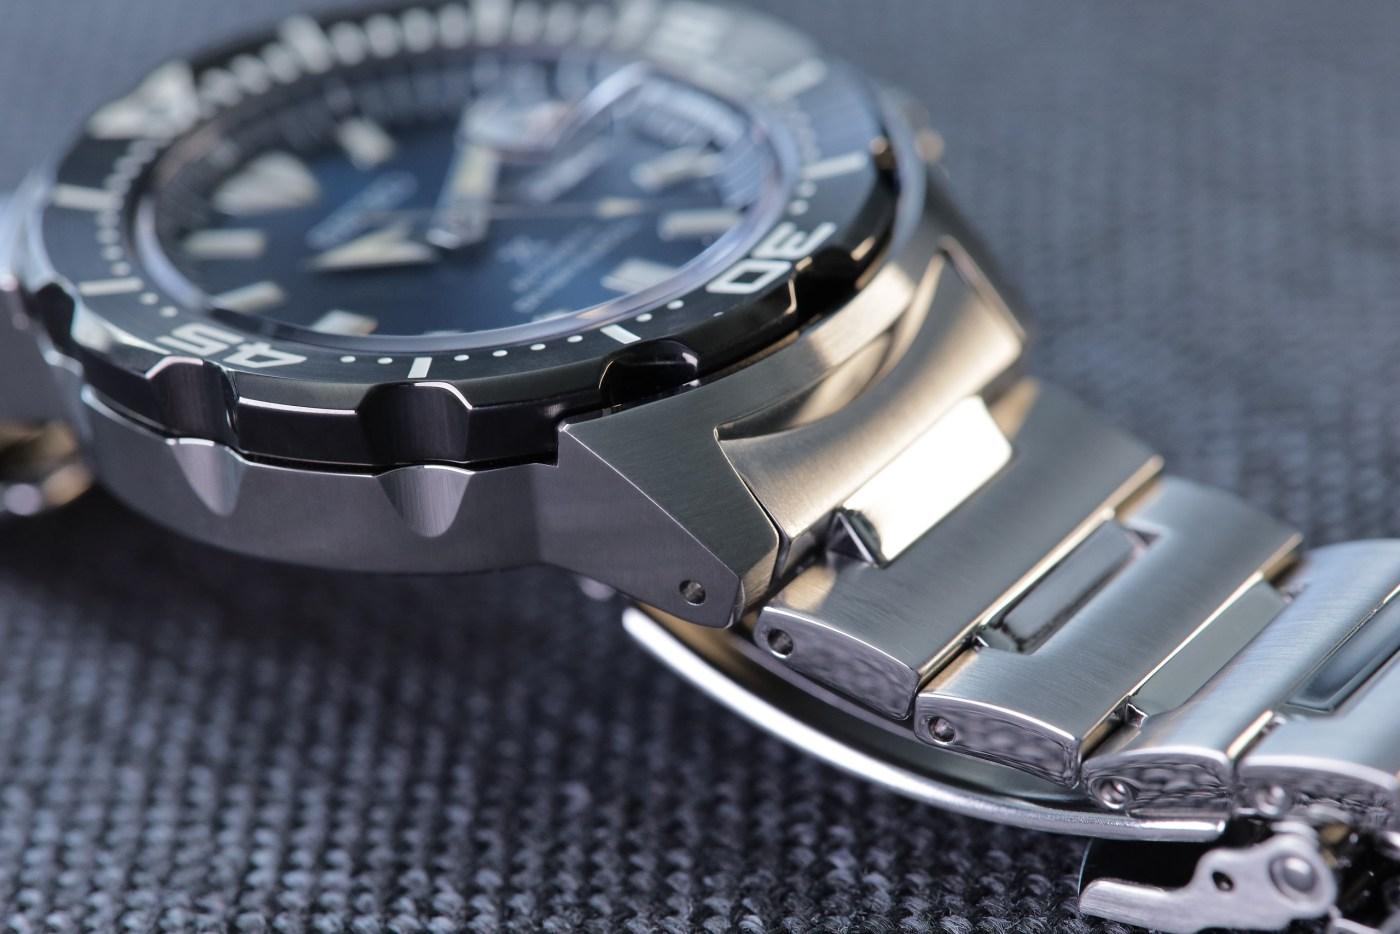 Seiko Prospex Ref SRPD25 Monster Automatic Diver case detail